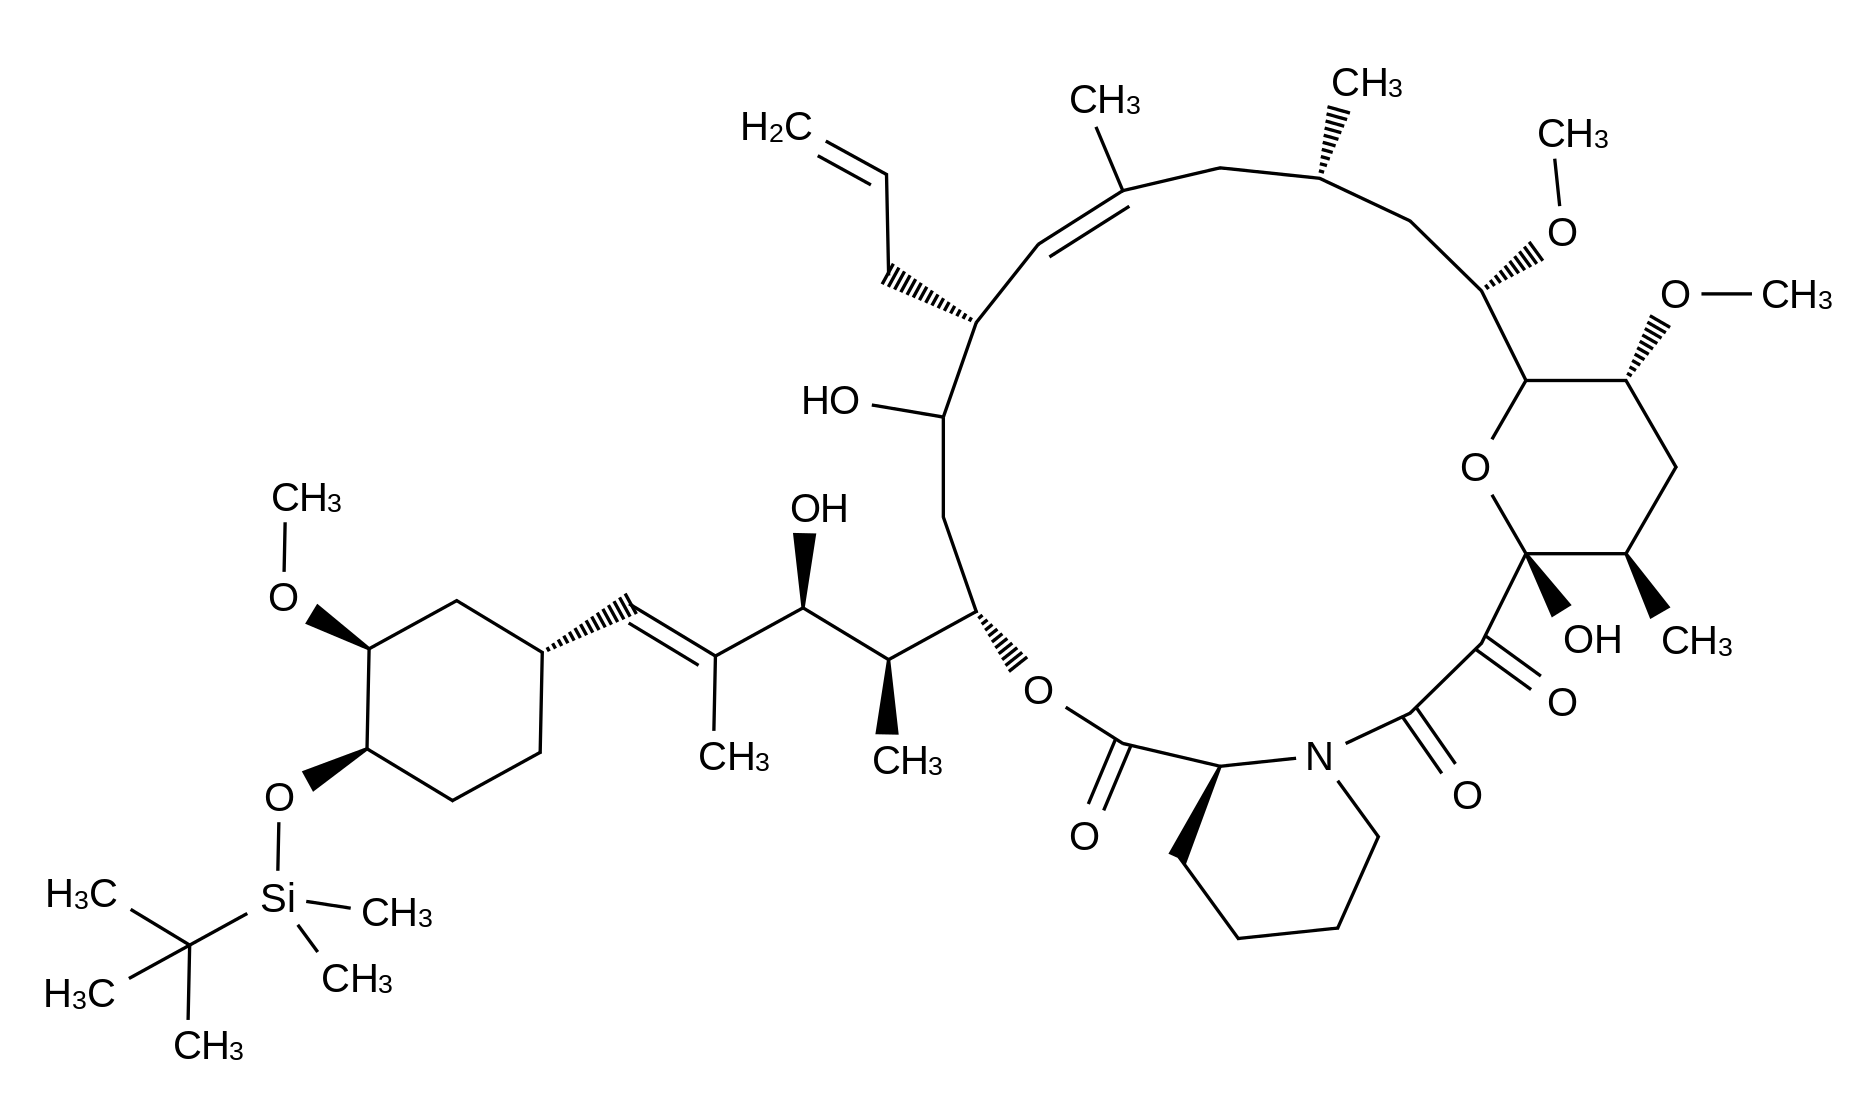 22-Hydroxy-33-tert-butyldimethylsilyloxy-iso-FK-506